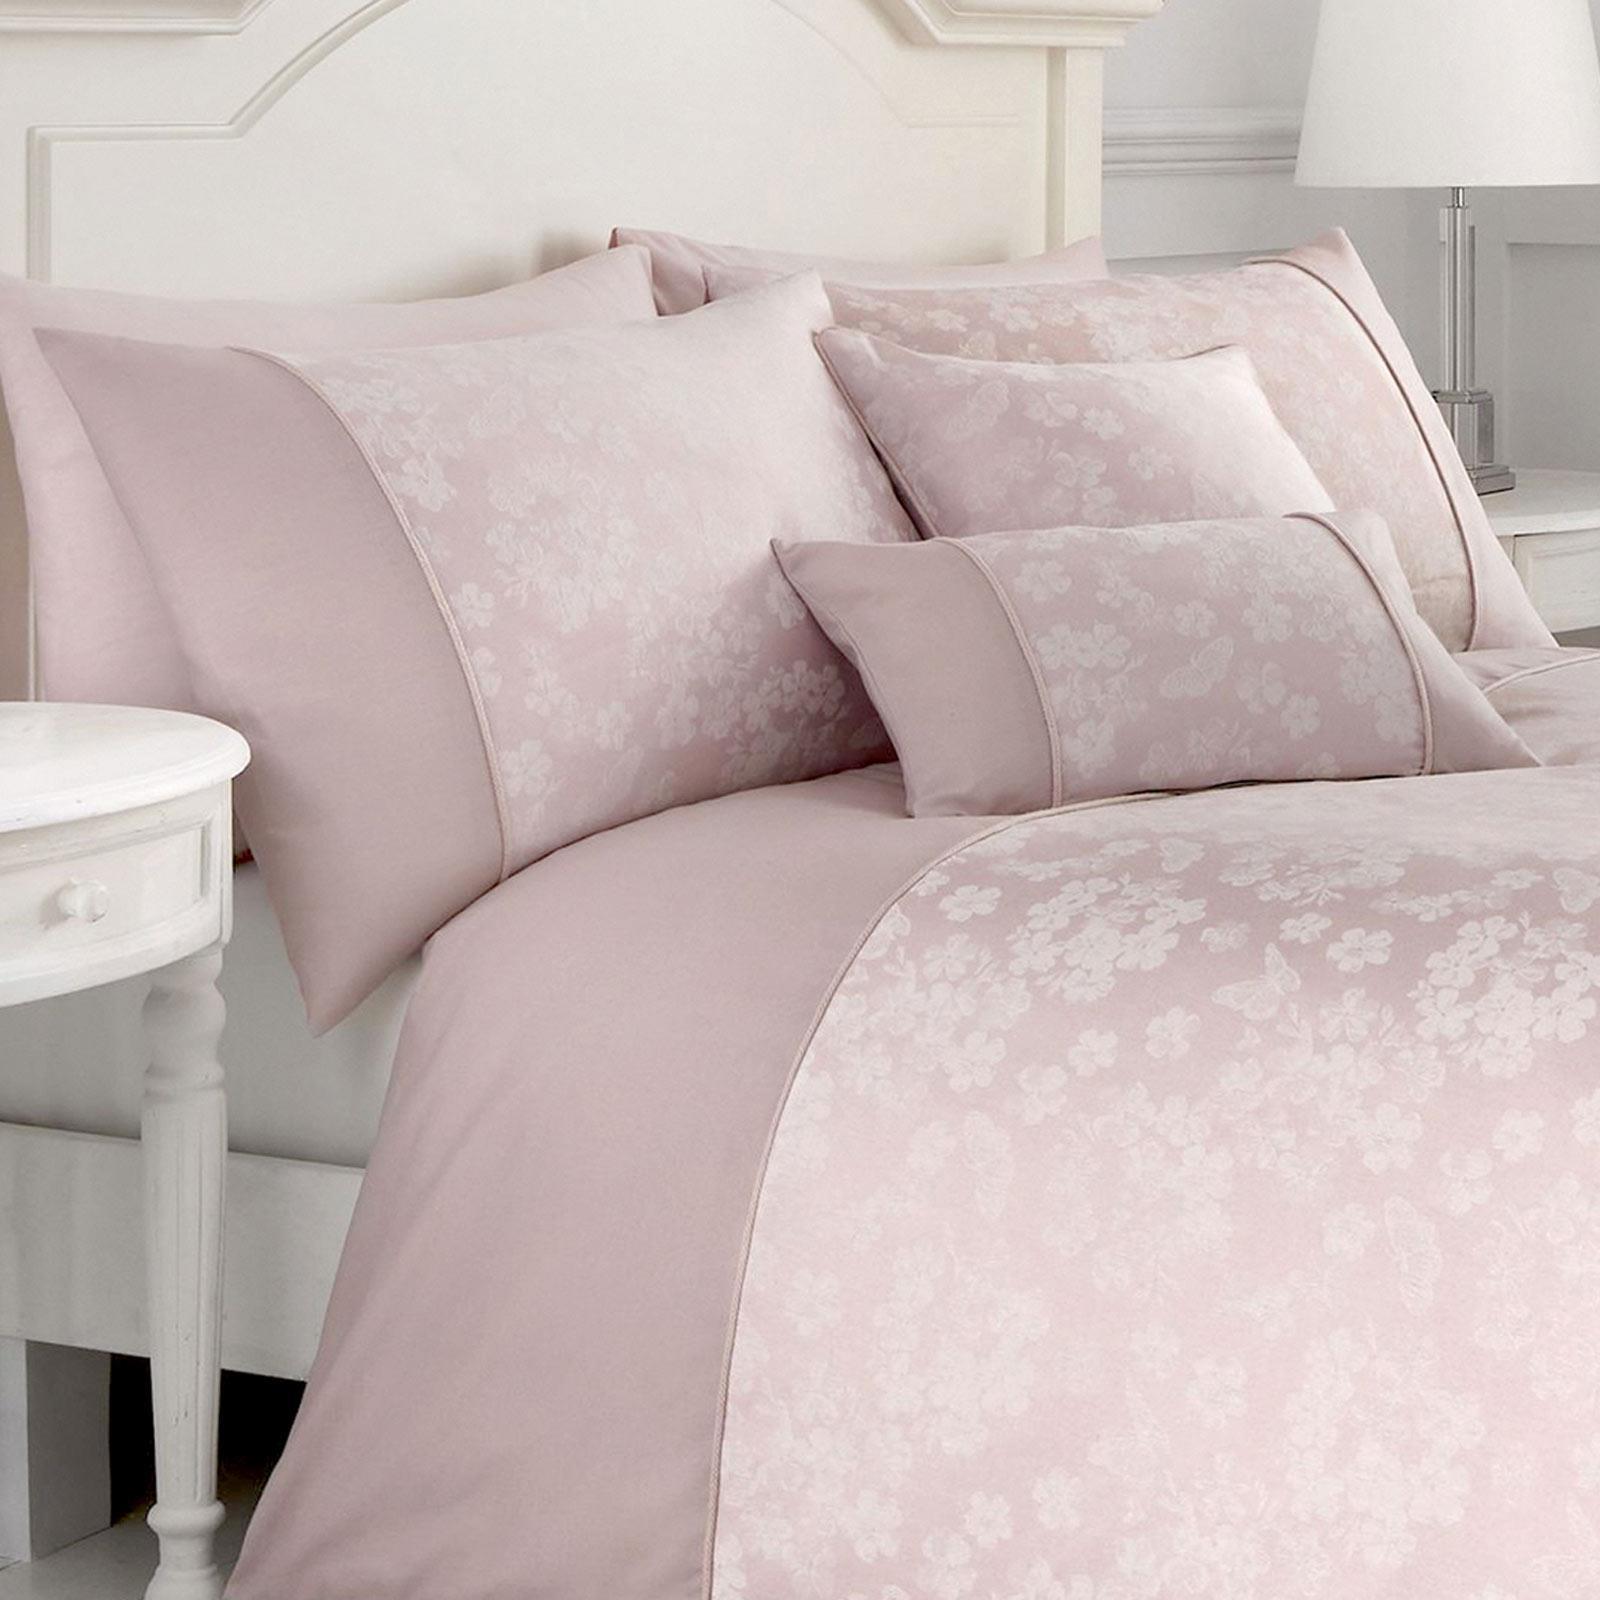 Fundas-de-Edredon-Rosa-Blush-Jacquard-Floral-Cubierta-Del-Edredon-Conjuntos-de-Ropa-de-cama-de-lujo miniatura 19